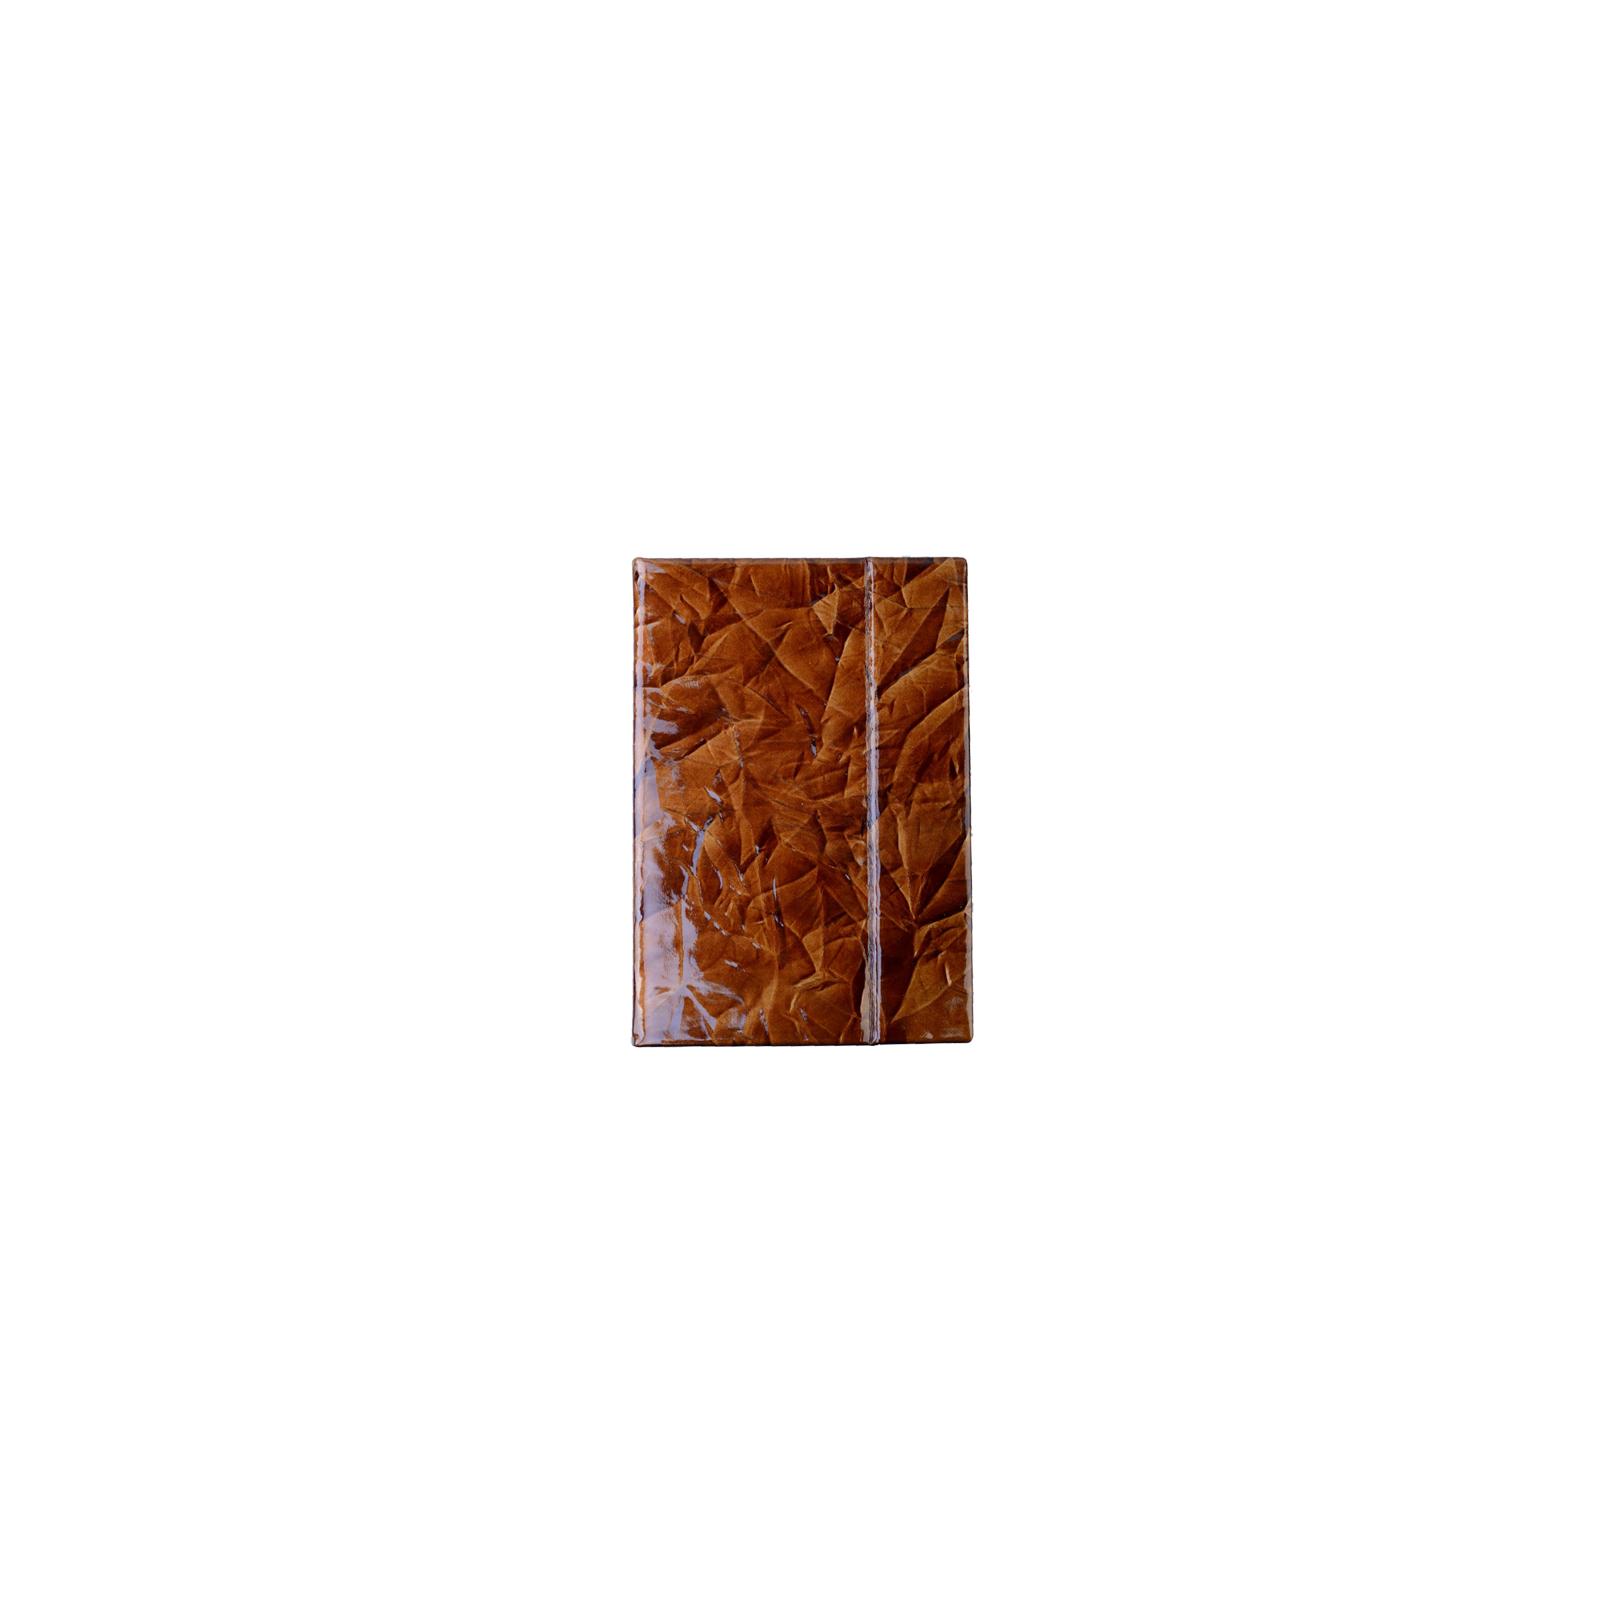 Чехол для планшета Vento 10.1 Desire glossy -brown lacotte изображение 2